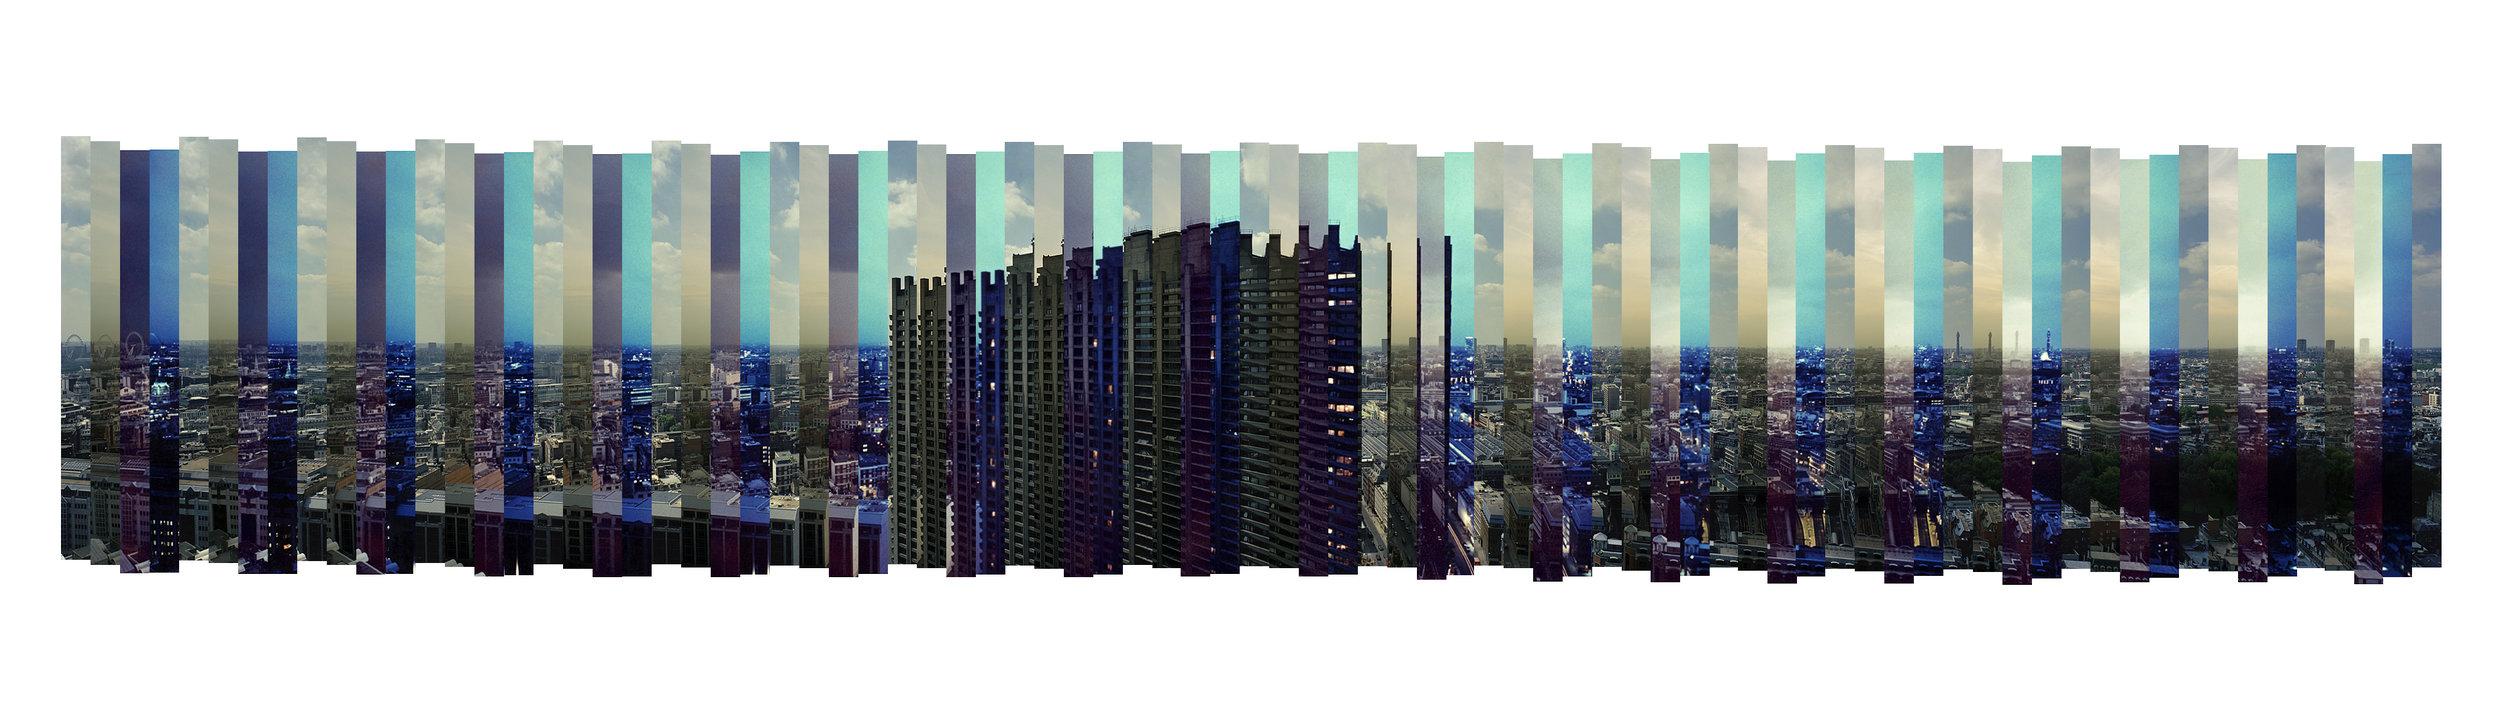 Concrete God Collage.jpg